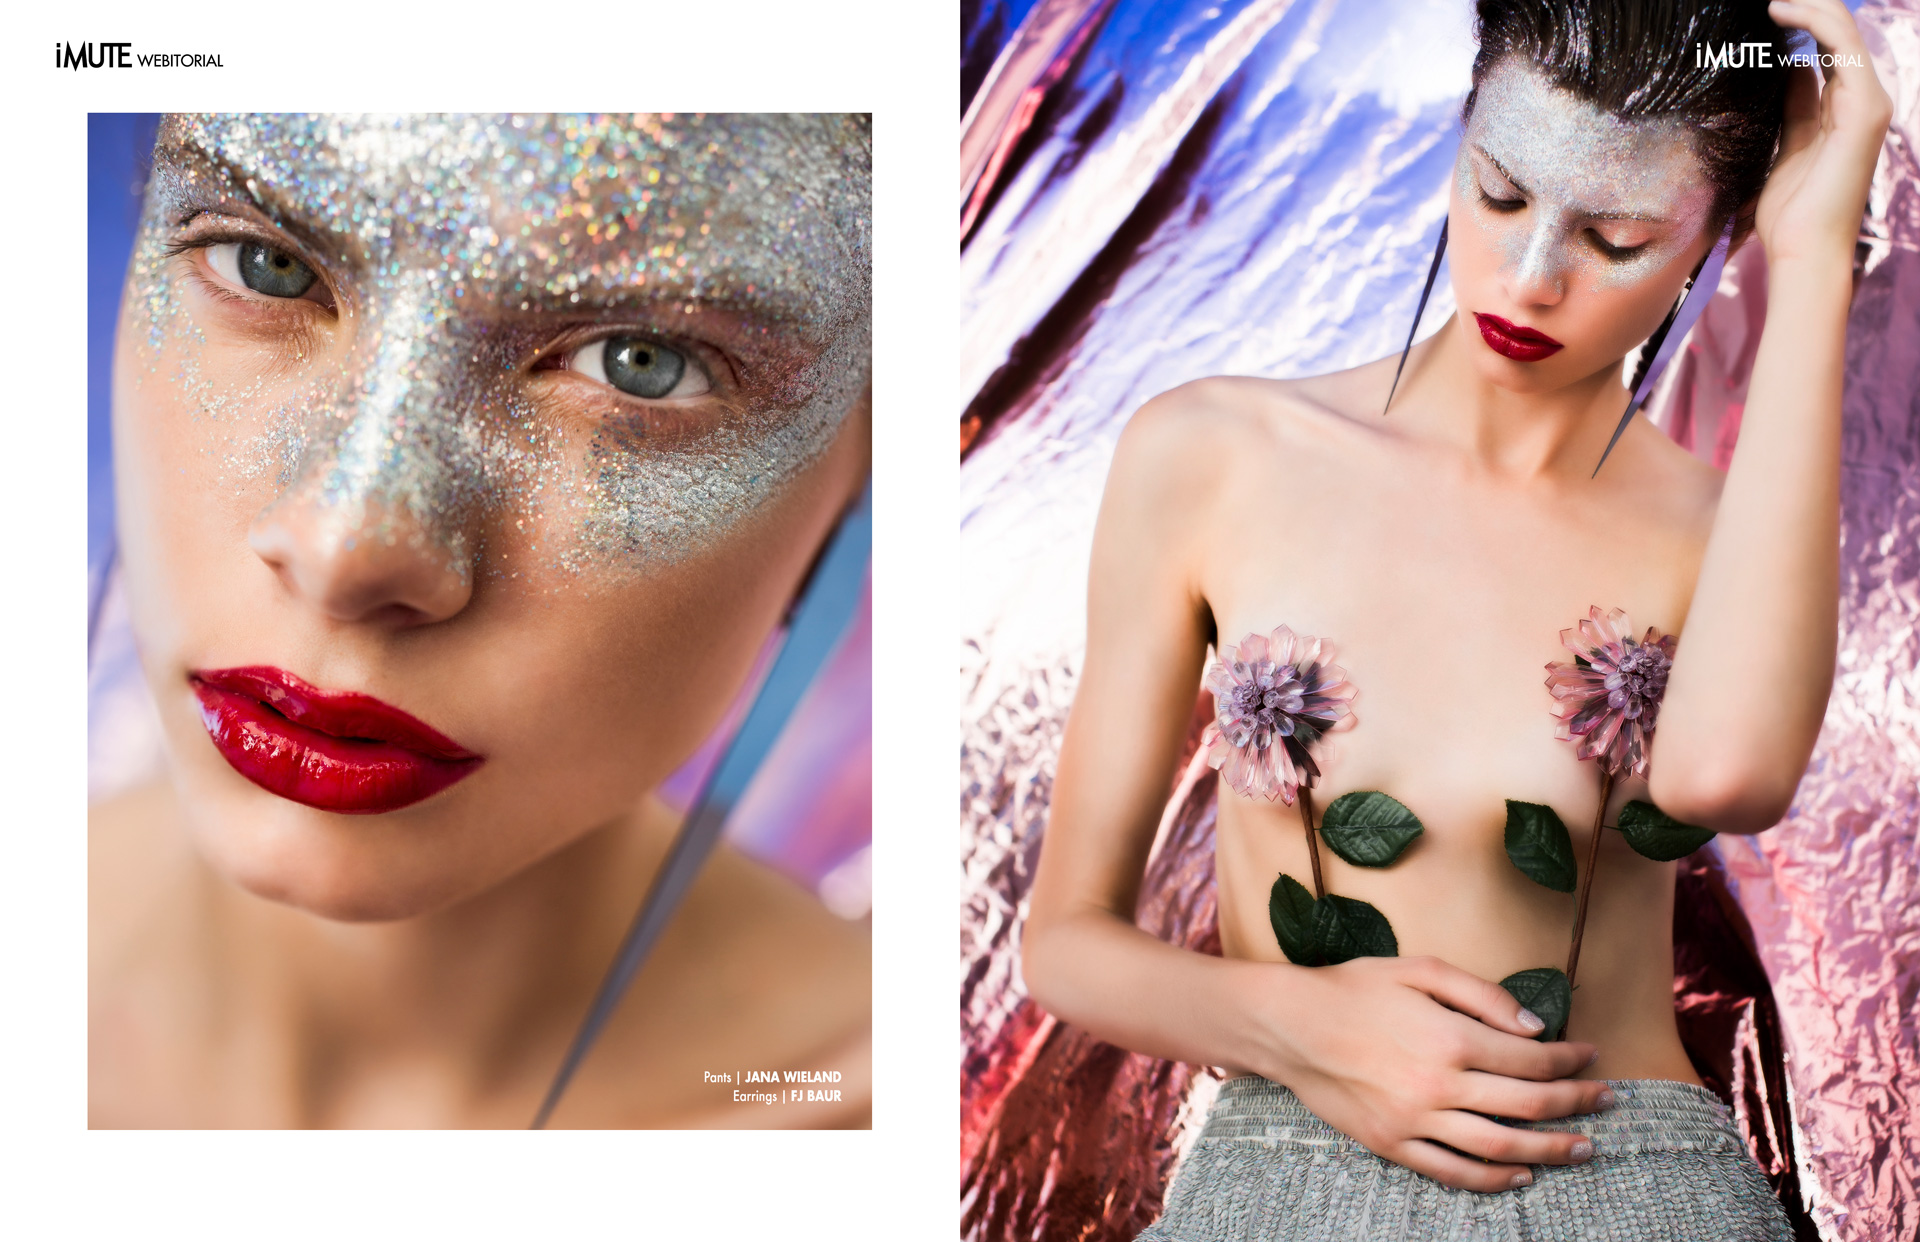 Silver Lining webitorial for iMute Magazine Photographer|Mia Feliné Model| Ema B. @Exit Model Management Stylist|Julia Philippitsch Makeup & Hair|Anna Winkelmeier